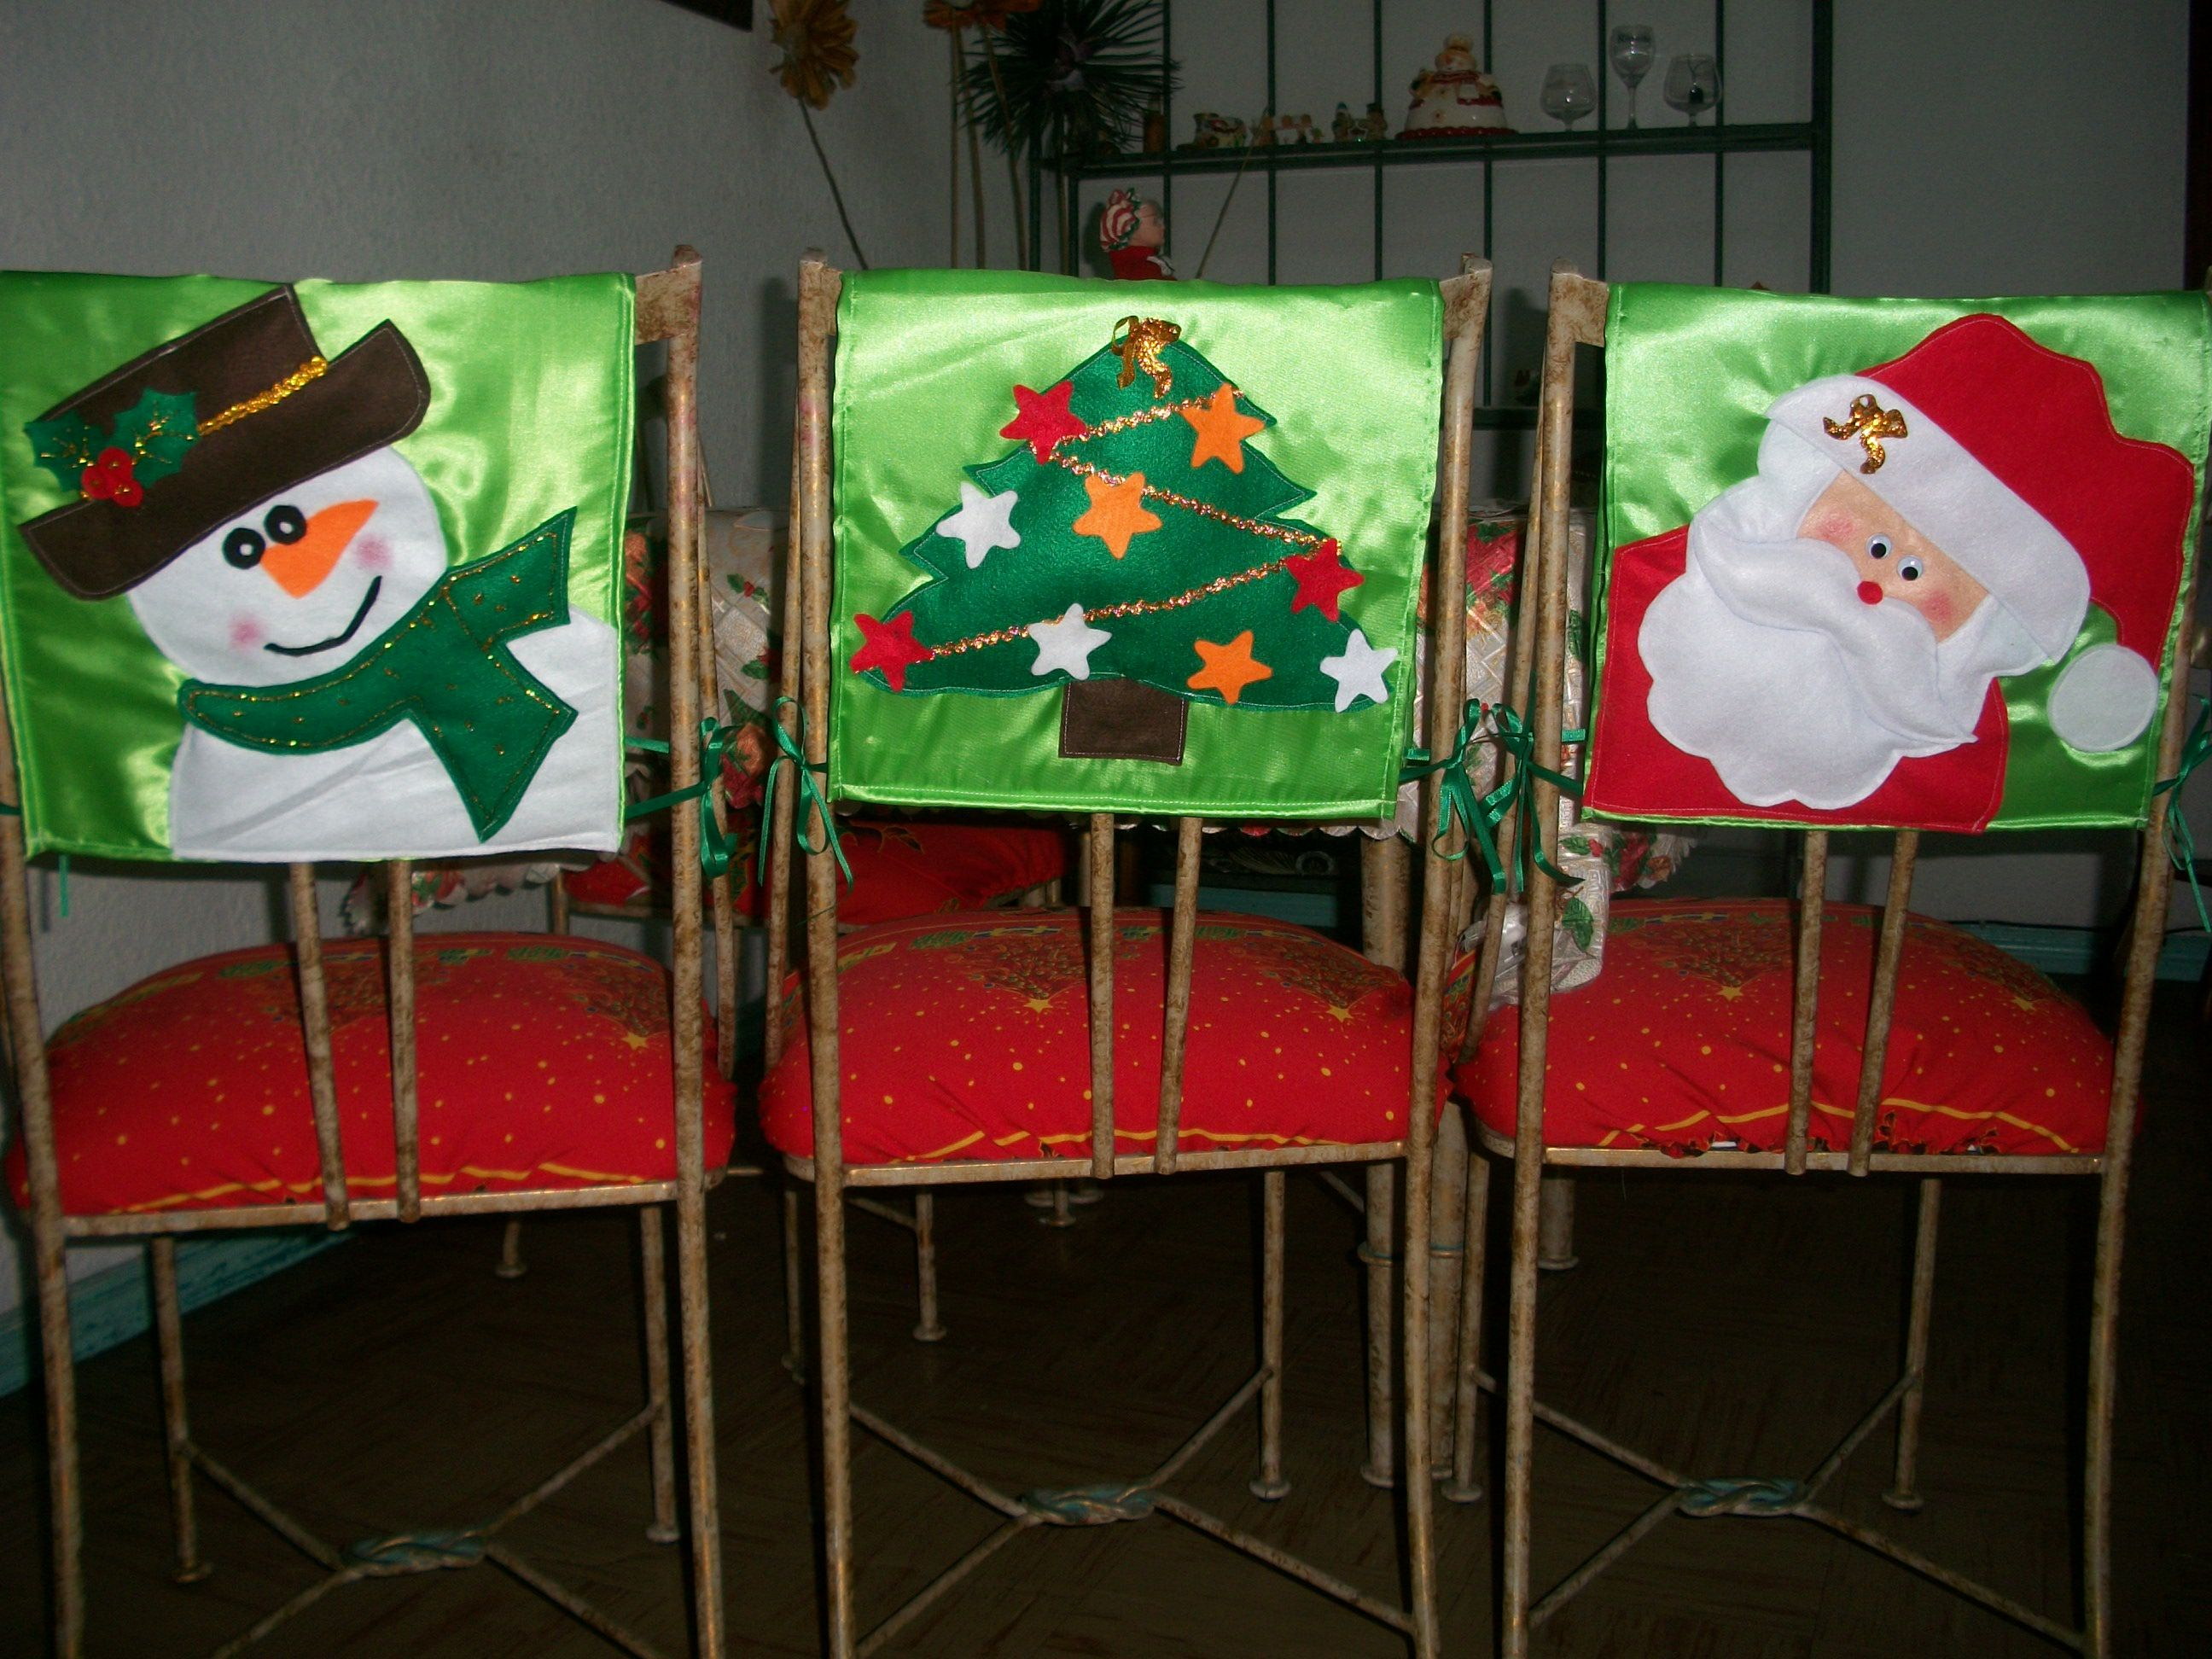 Cubresillas navide os capas cadeiras christmas for Adornos navidenos 2017 trackid sp 006